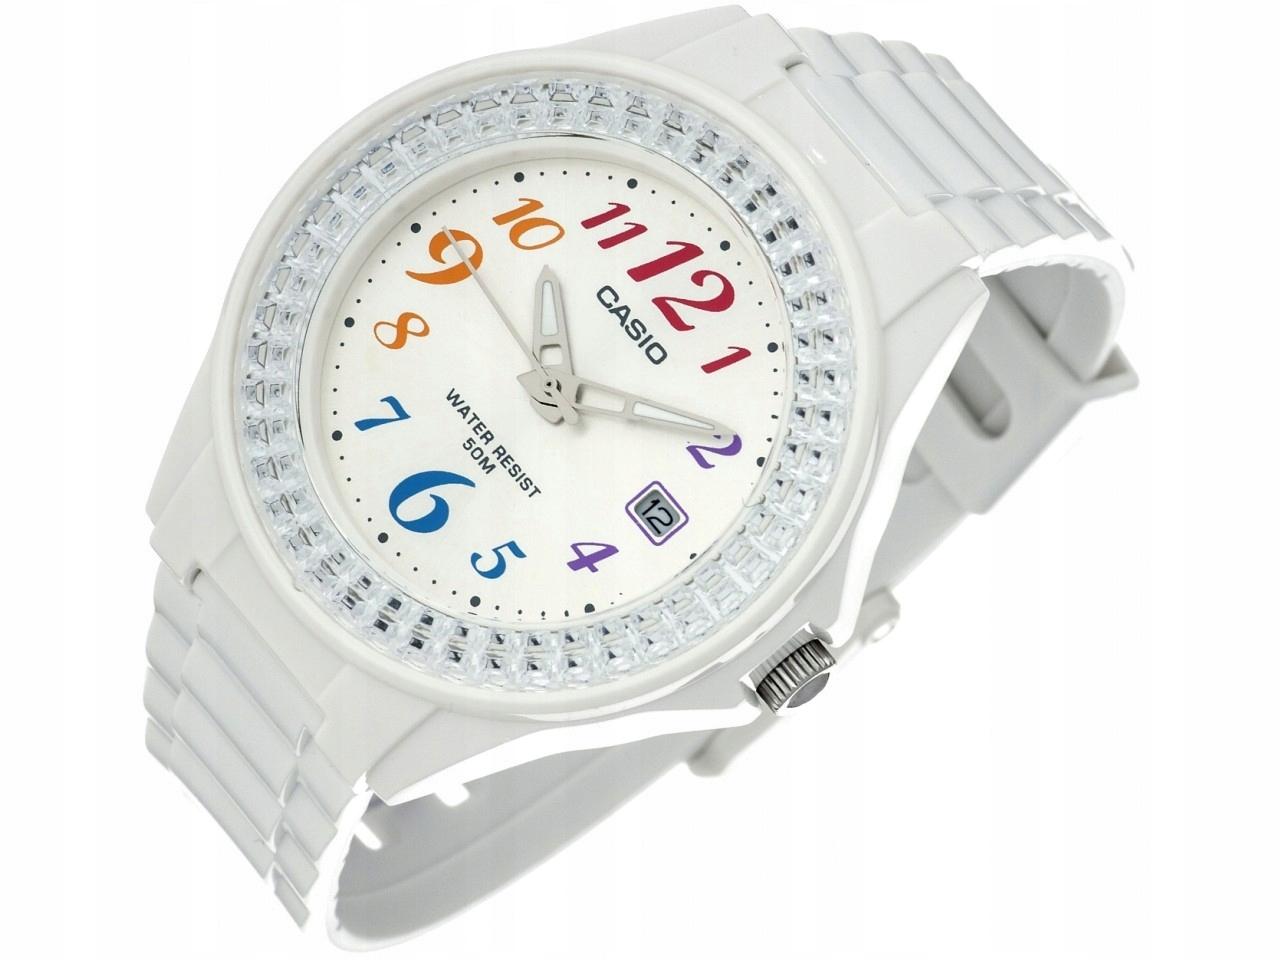 Đồng hồ nữ dây nhựa Casio LX-500H-7BVDF